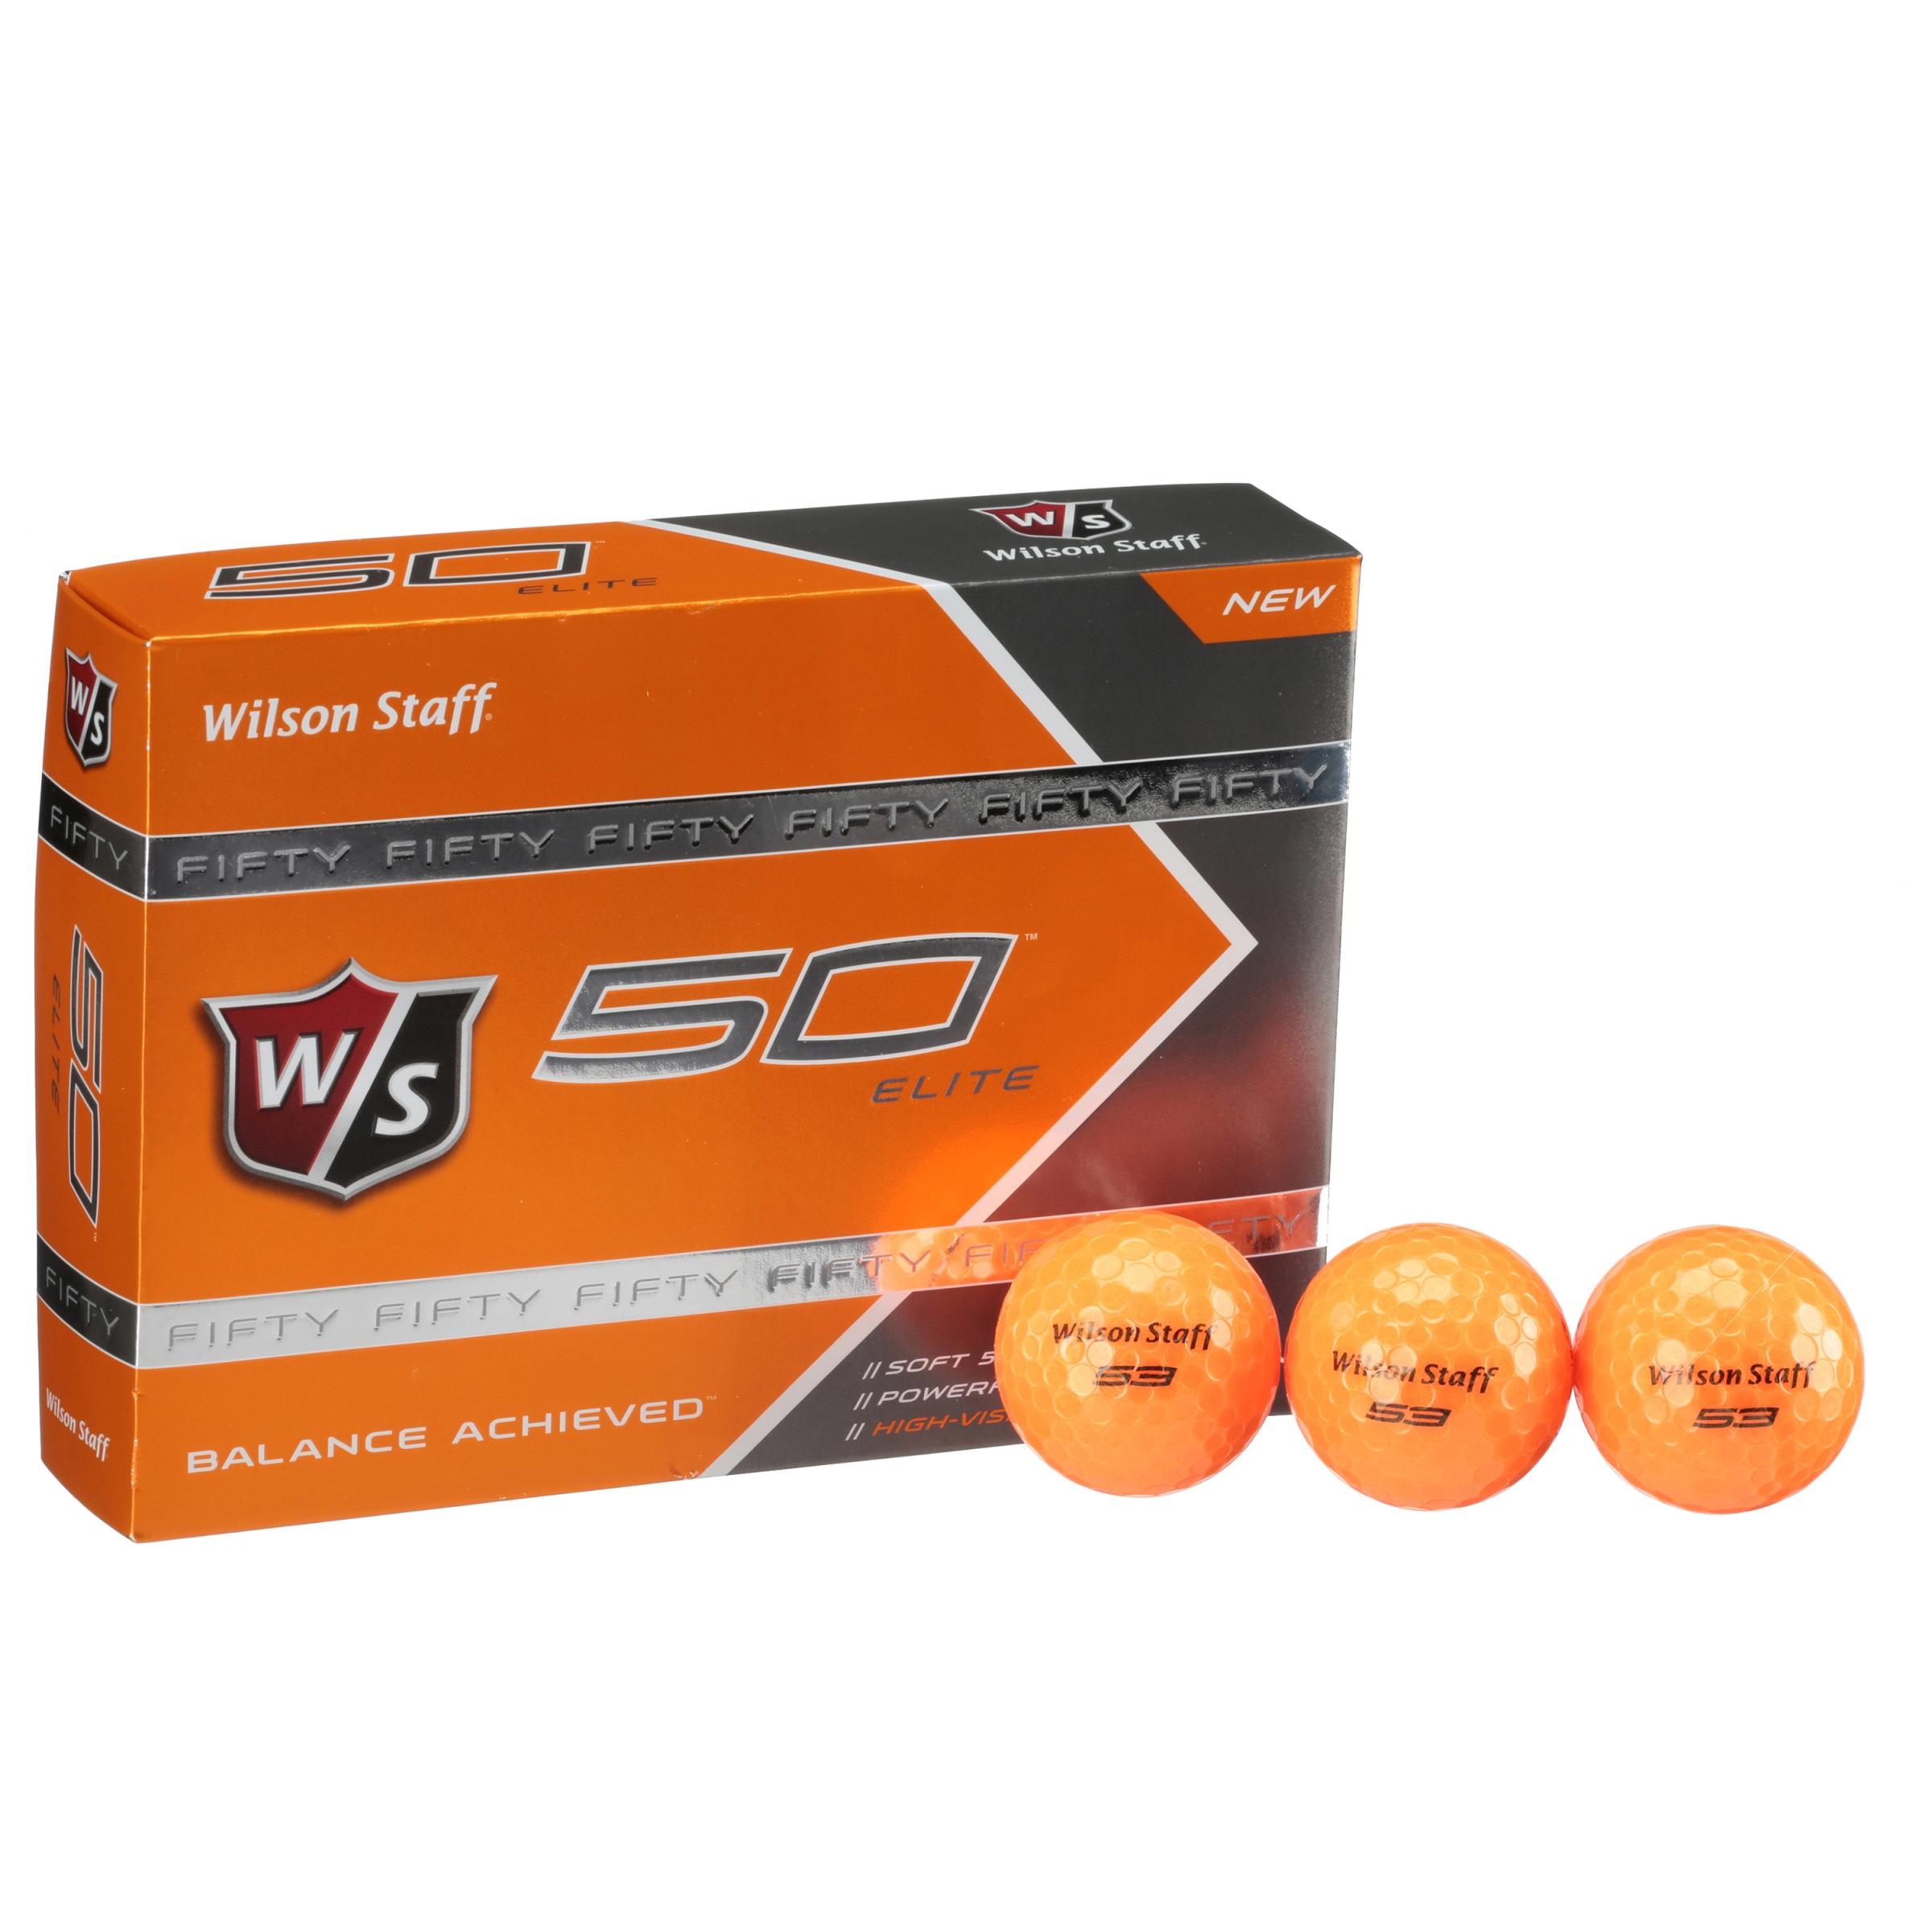 Wilson Staff 50 Elite High Visibility Golf Balls, Orange, 12 Pack